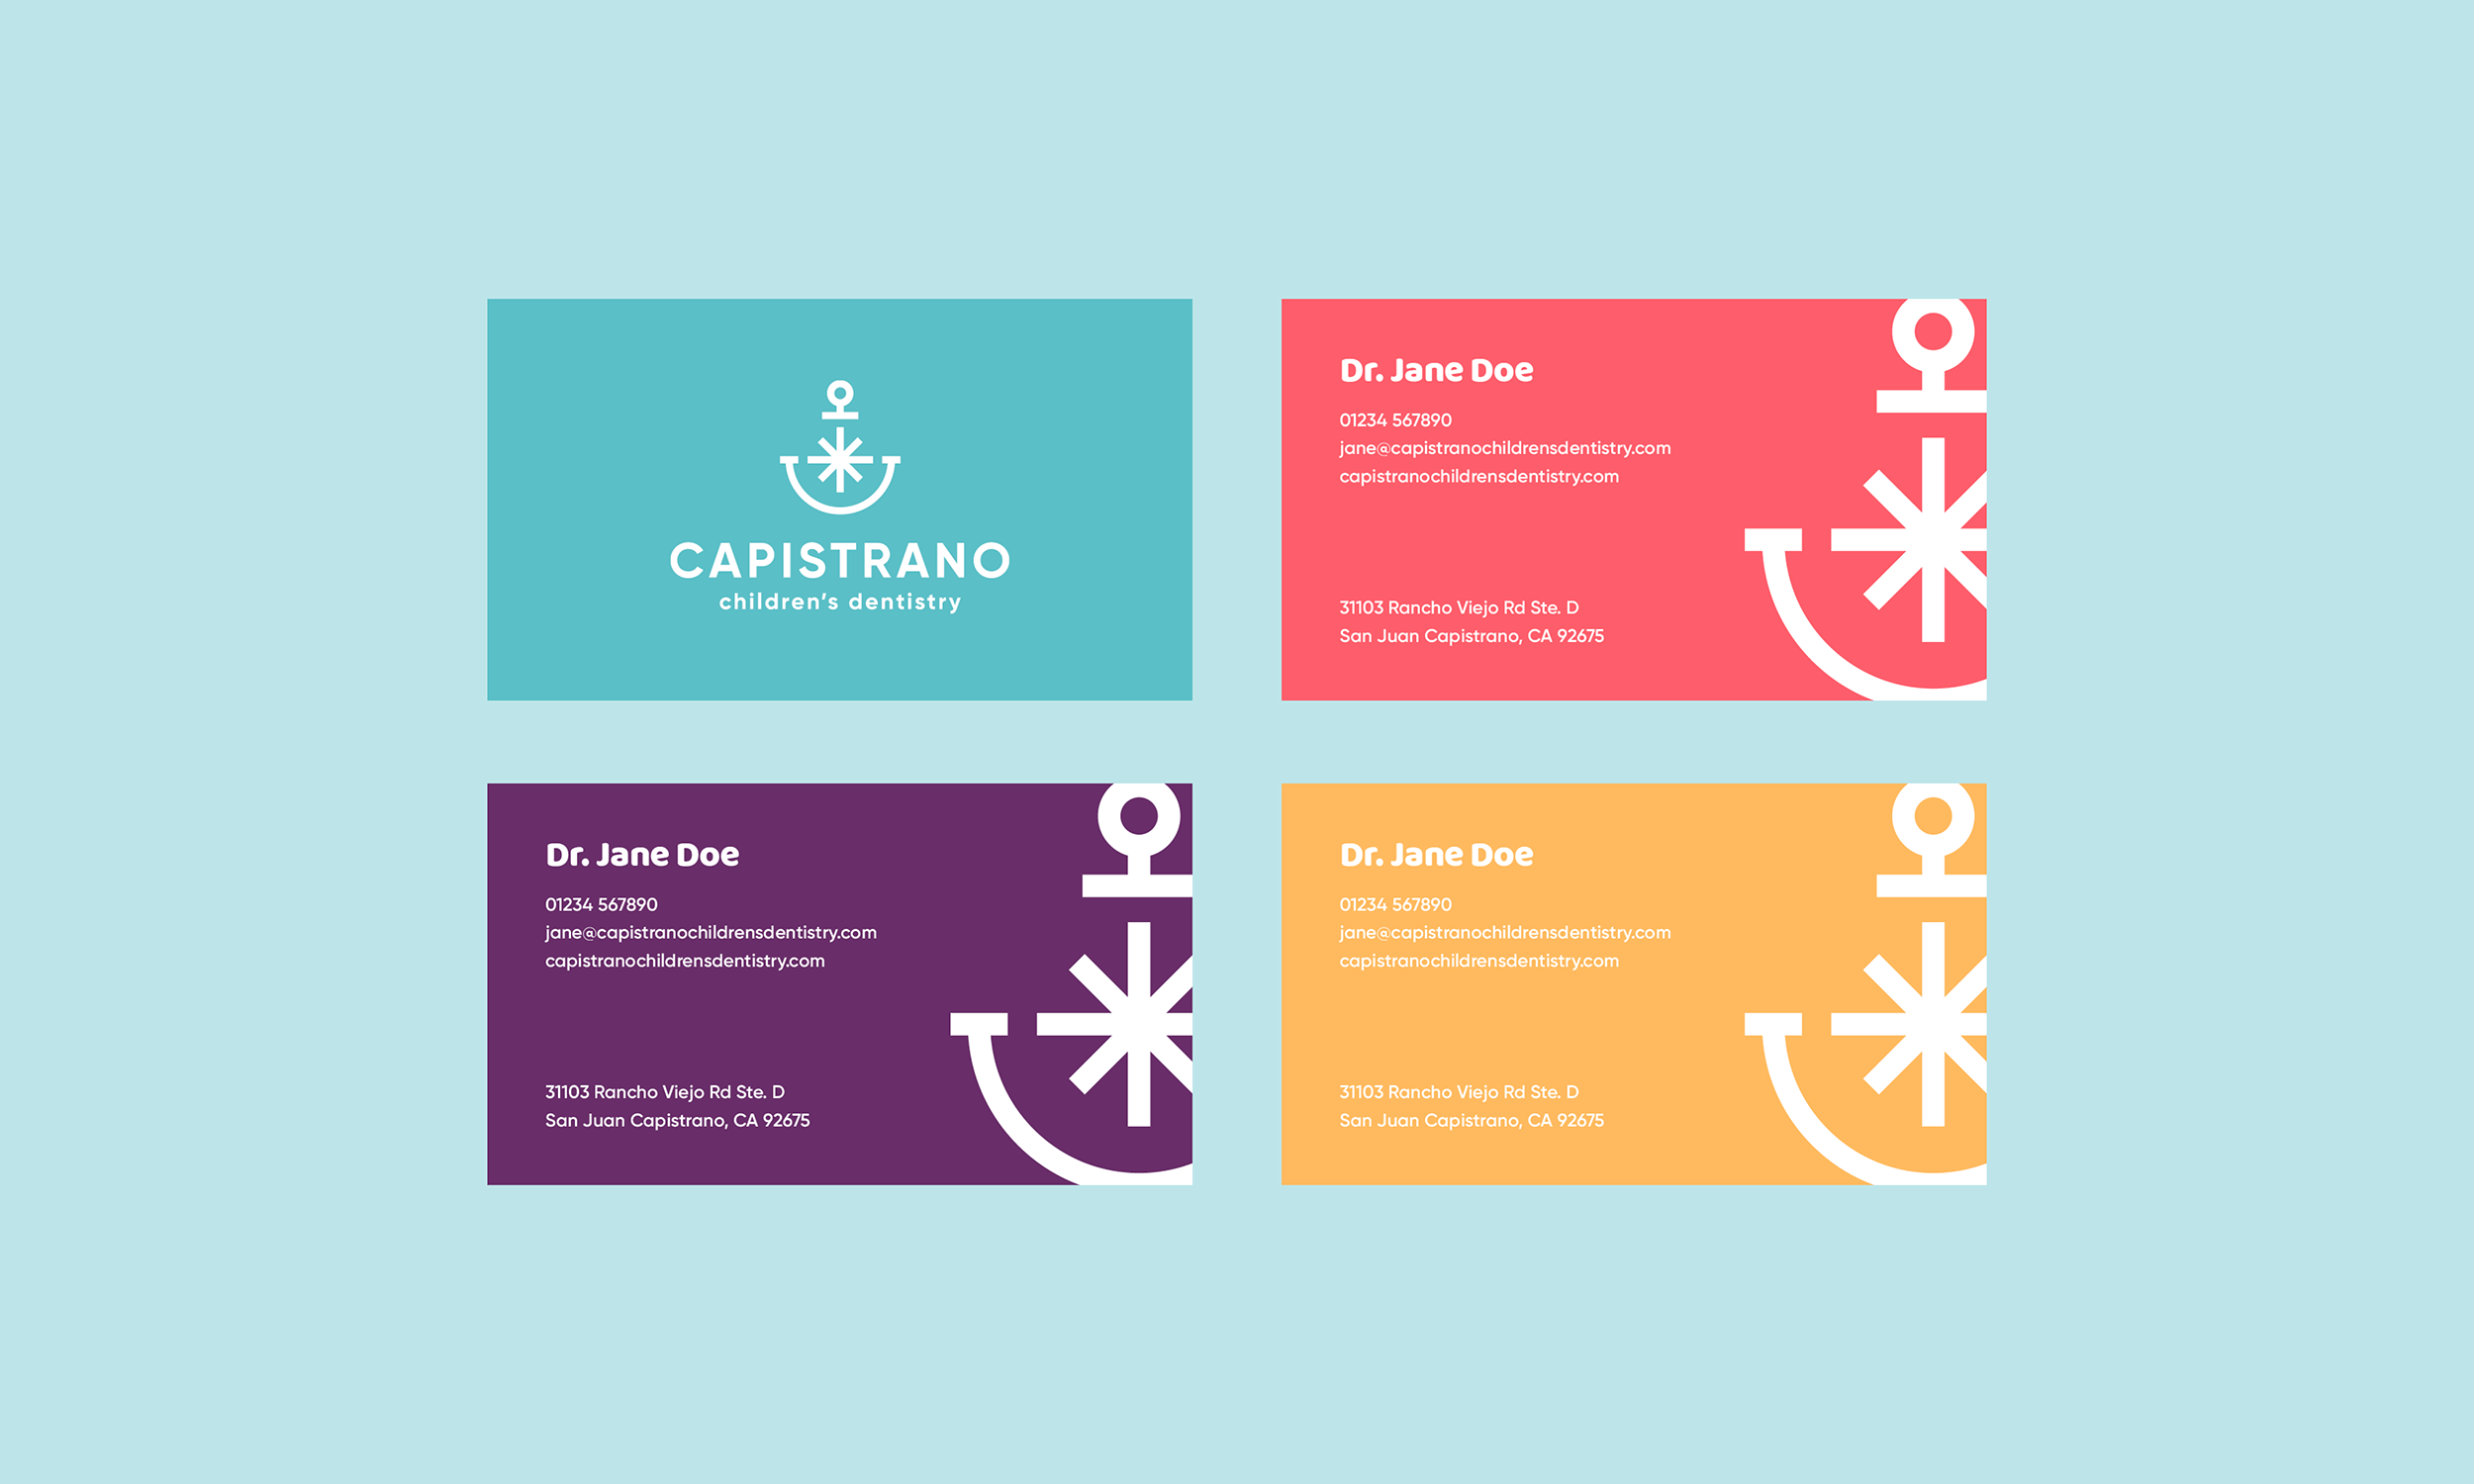 Capistrano-Childrens-Dentistry-Logo-Design-Freelance-Graphic-Designer-Margate-Kent-Presentation-Pediatric-Dental-Business-Card